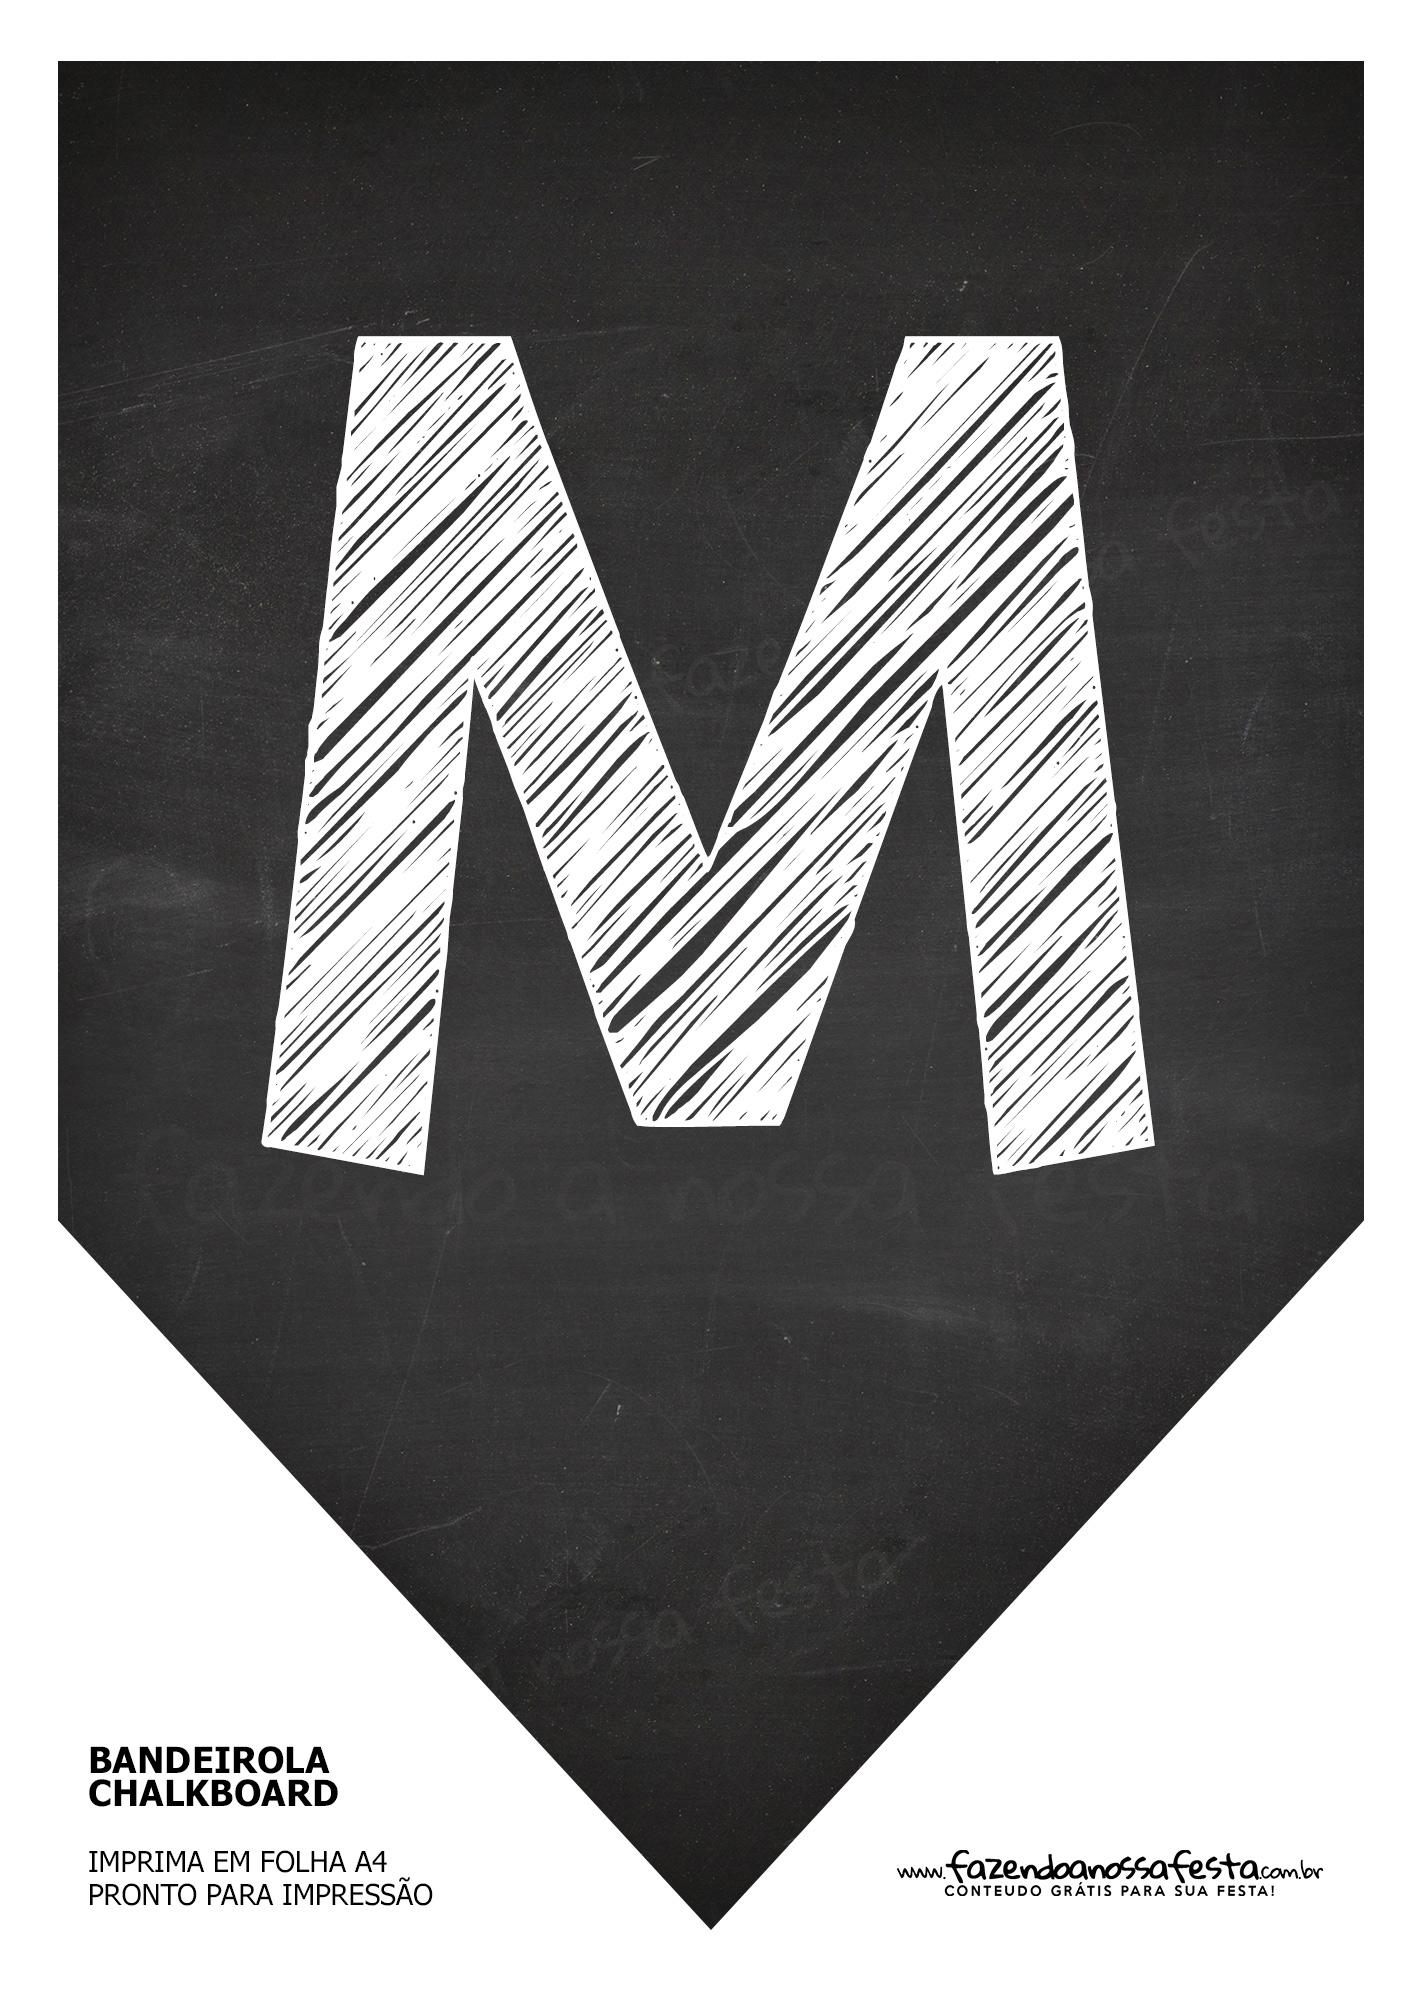 Bandeirinha Chalkboard M